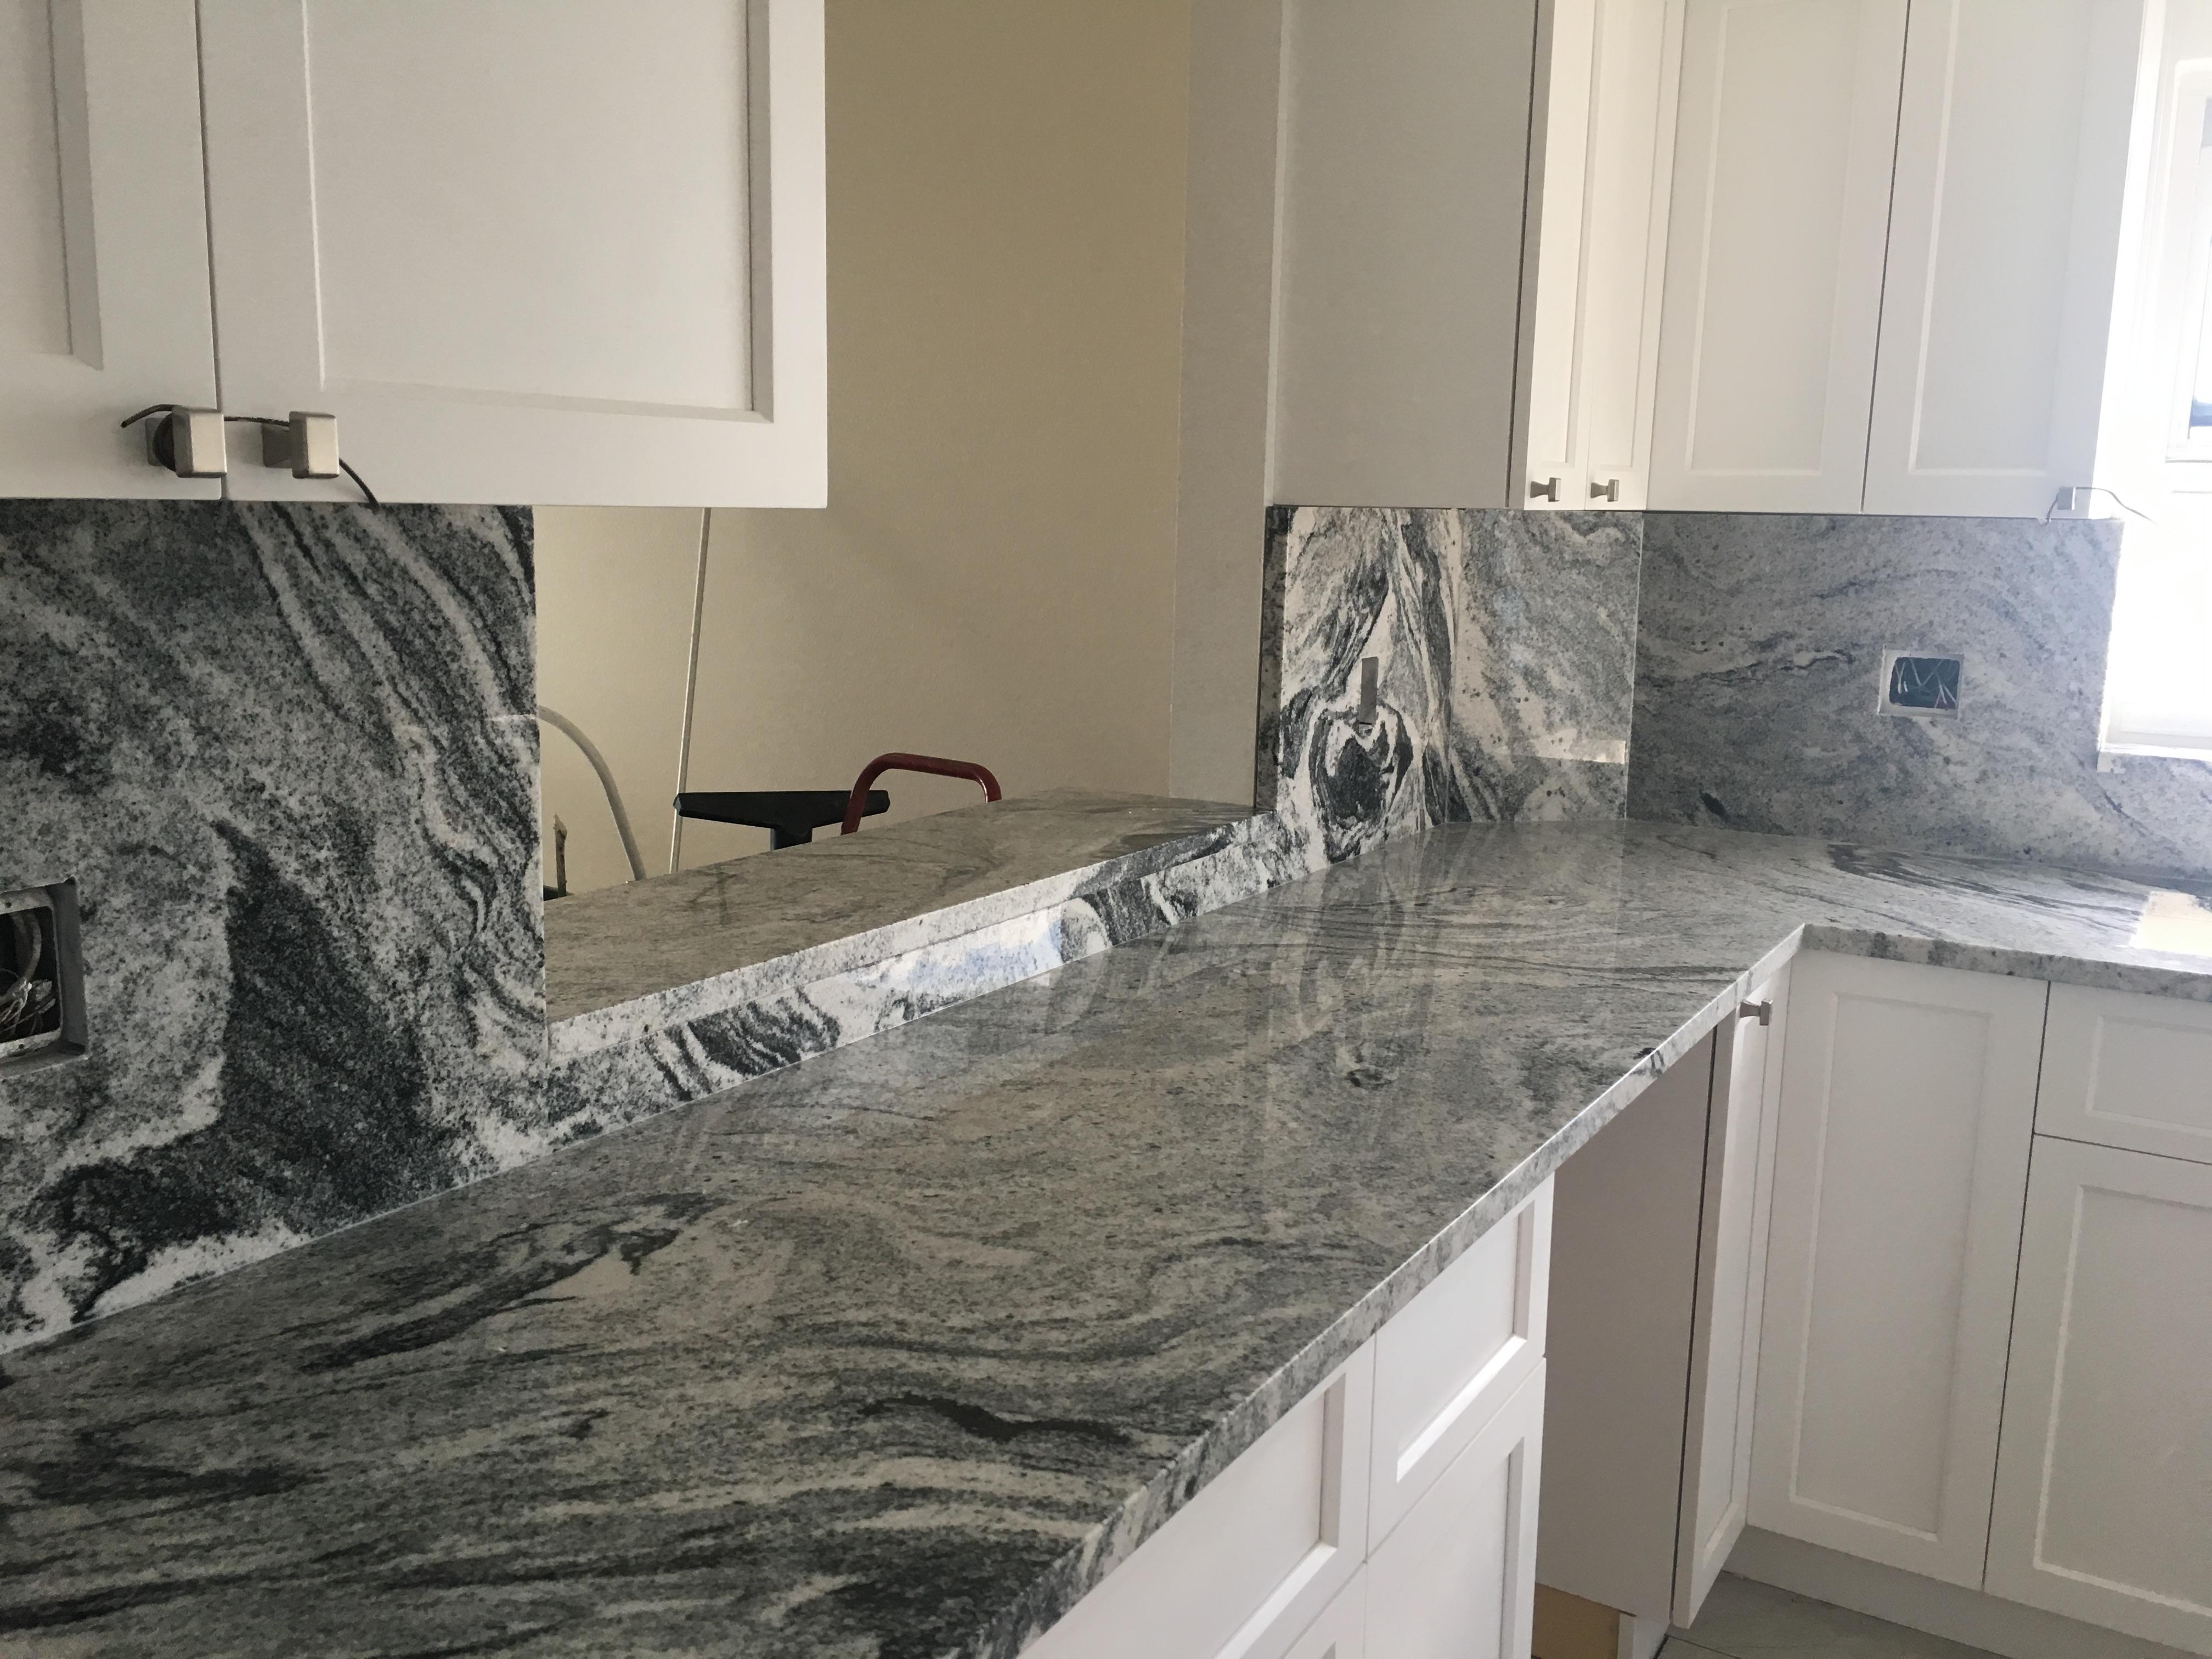 Viscount White kitchen granite counter top remodel in Largo Fl A&S